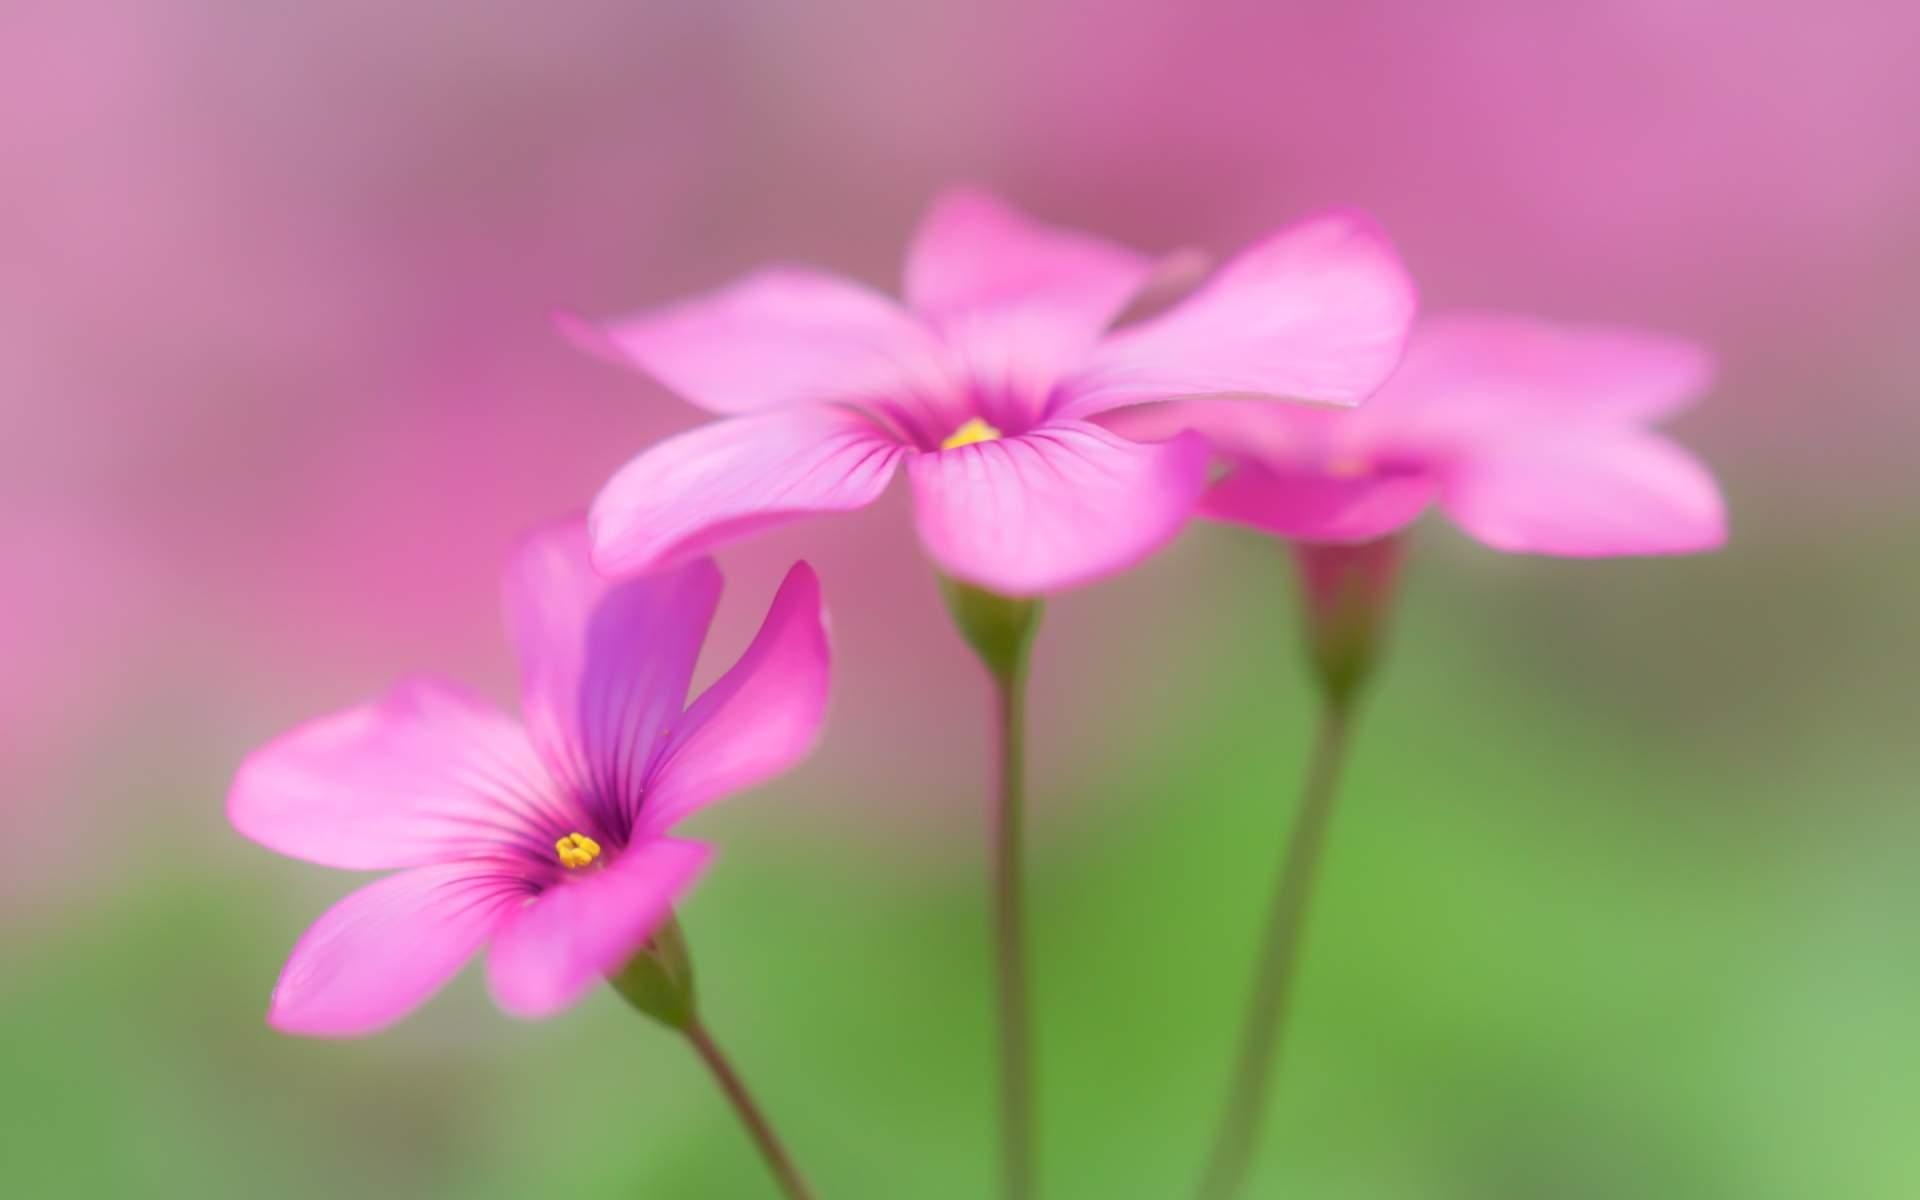 Download 1920x1200 Wallpaper Cute Pink Flowers Widescreen 1610